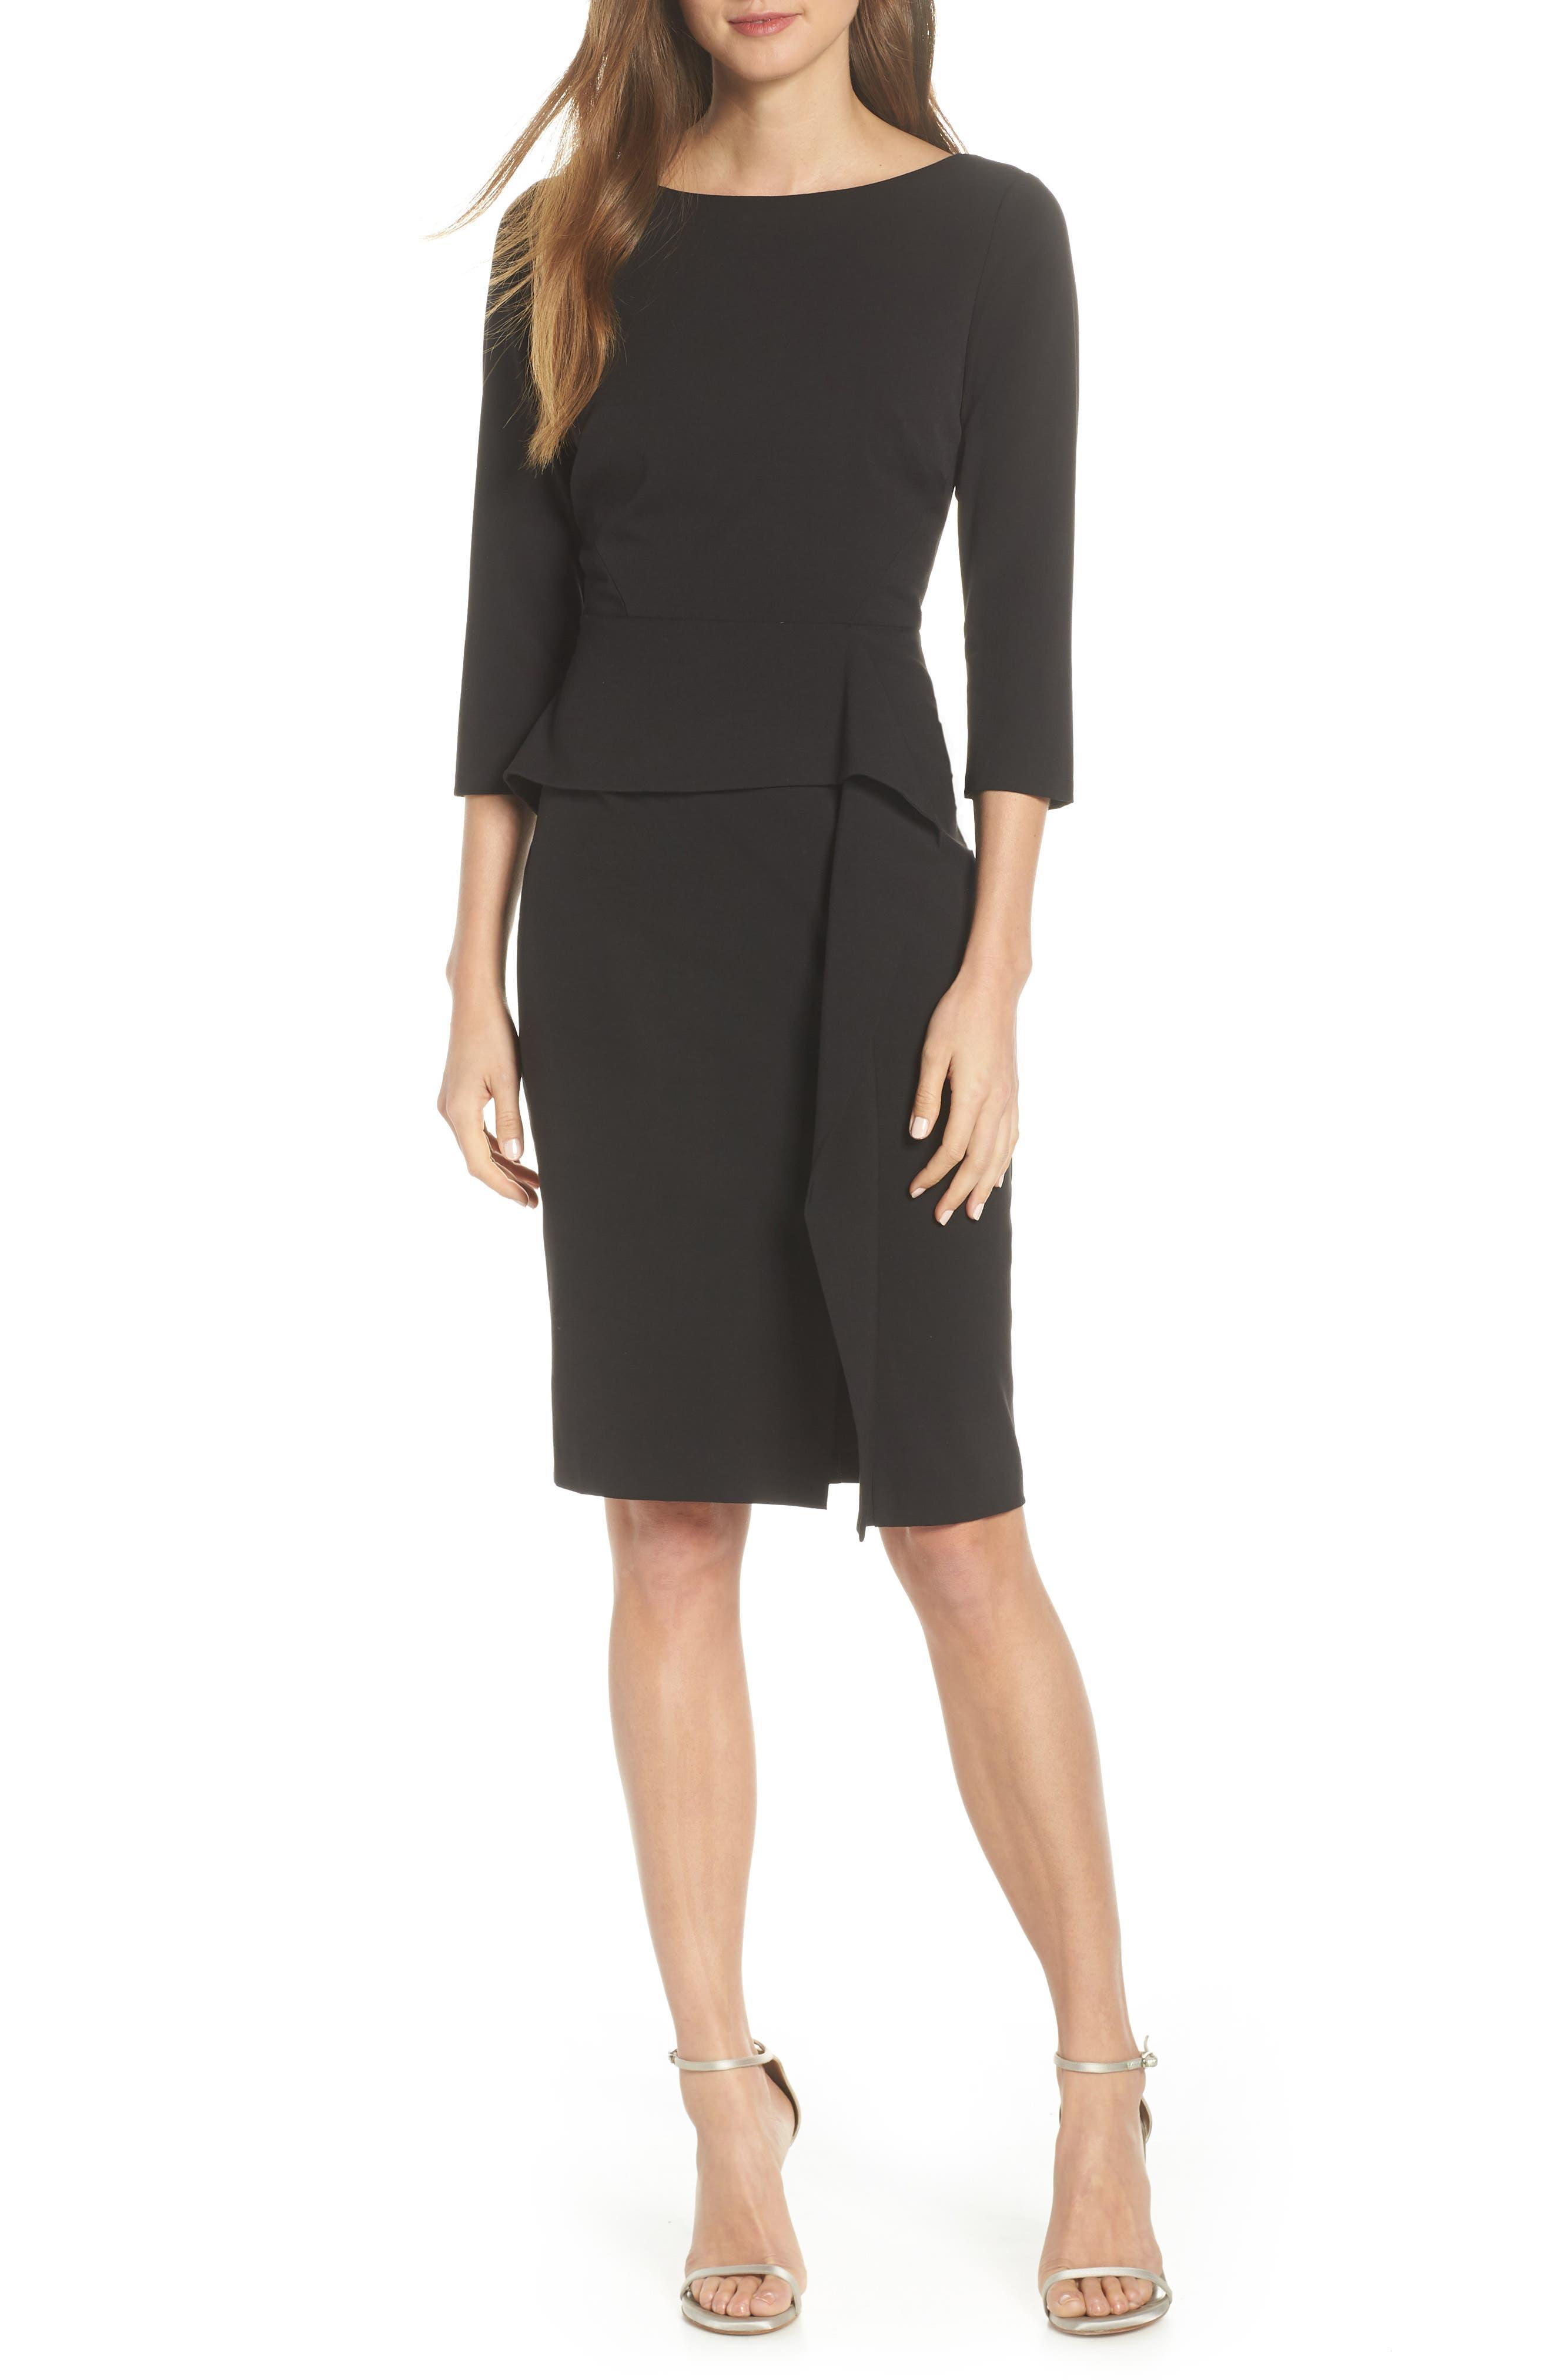 VINCE CAMUTO,                             Angled Ruffle Sheath Dress,                             Main thumbnail 1, color,                             BLACK